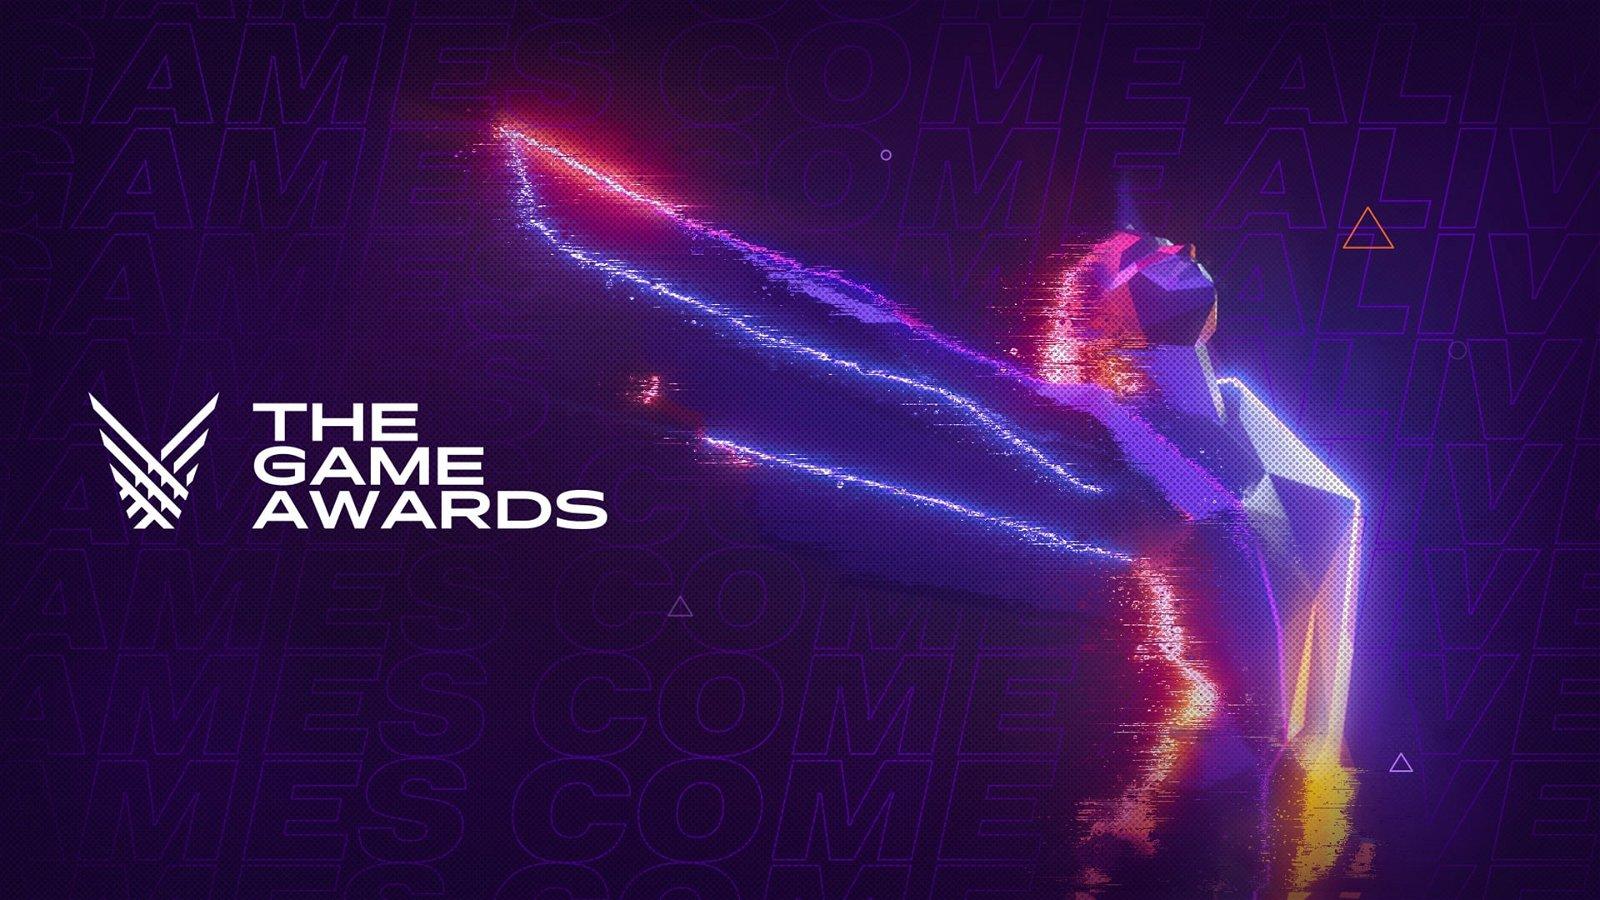 ICYMI: A Full Recap of The Game Awards 2019 4